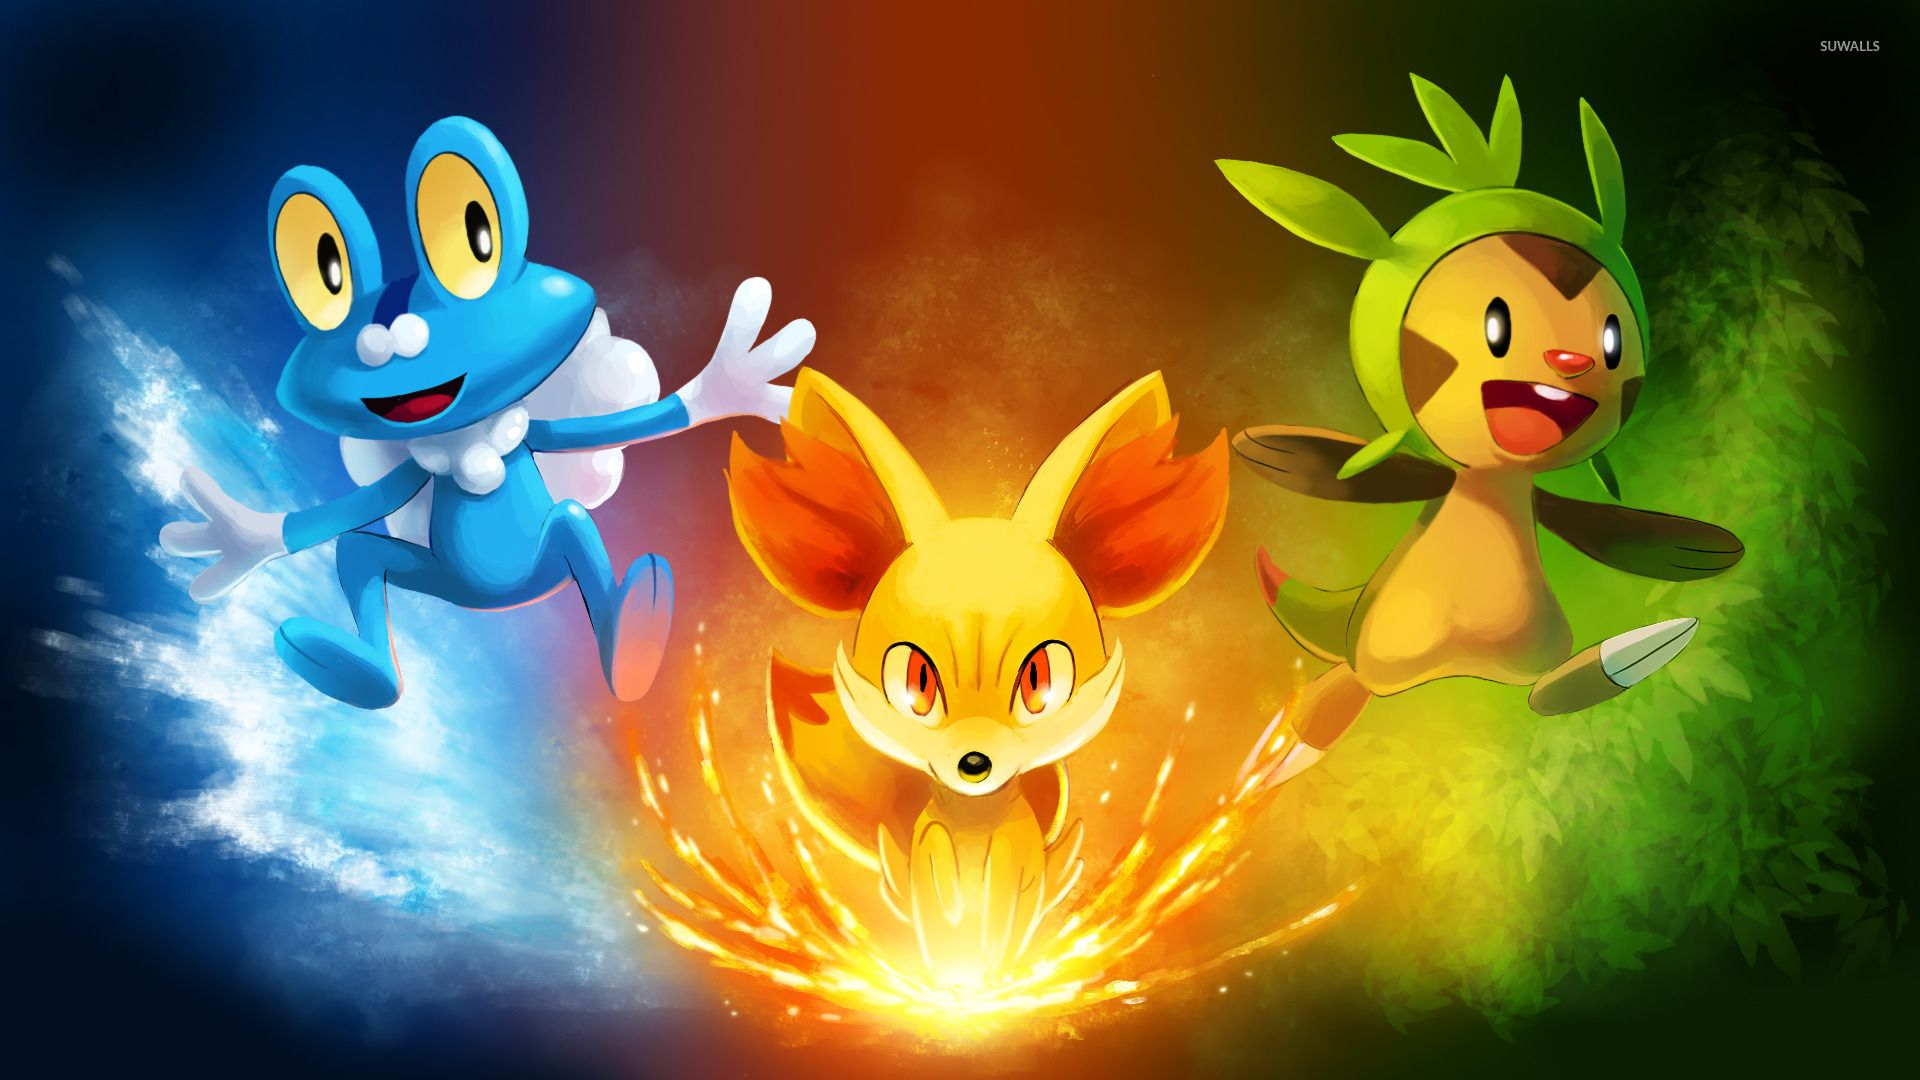 Pokemon xy pc download full version free